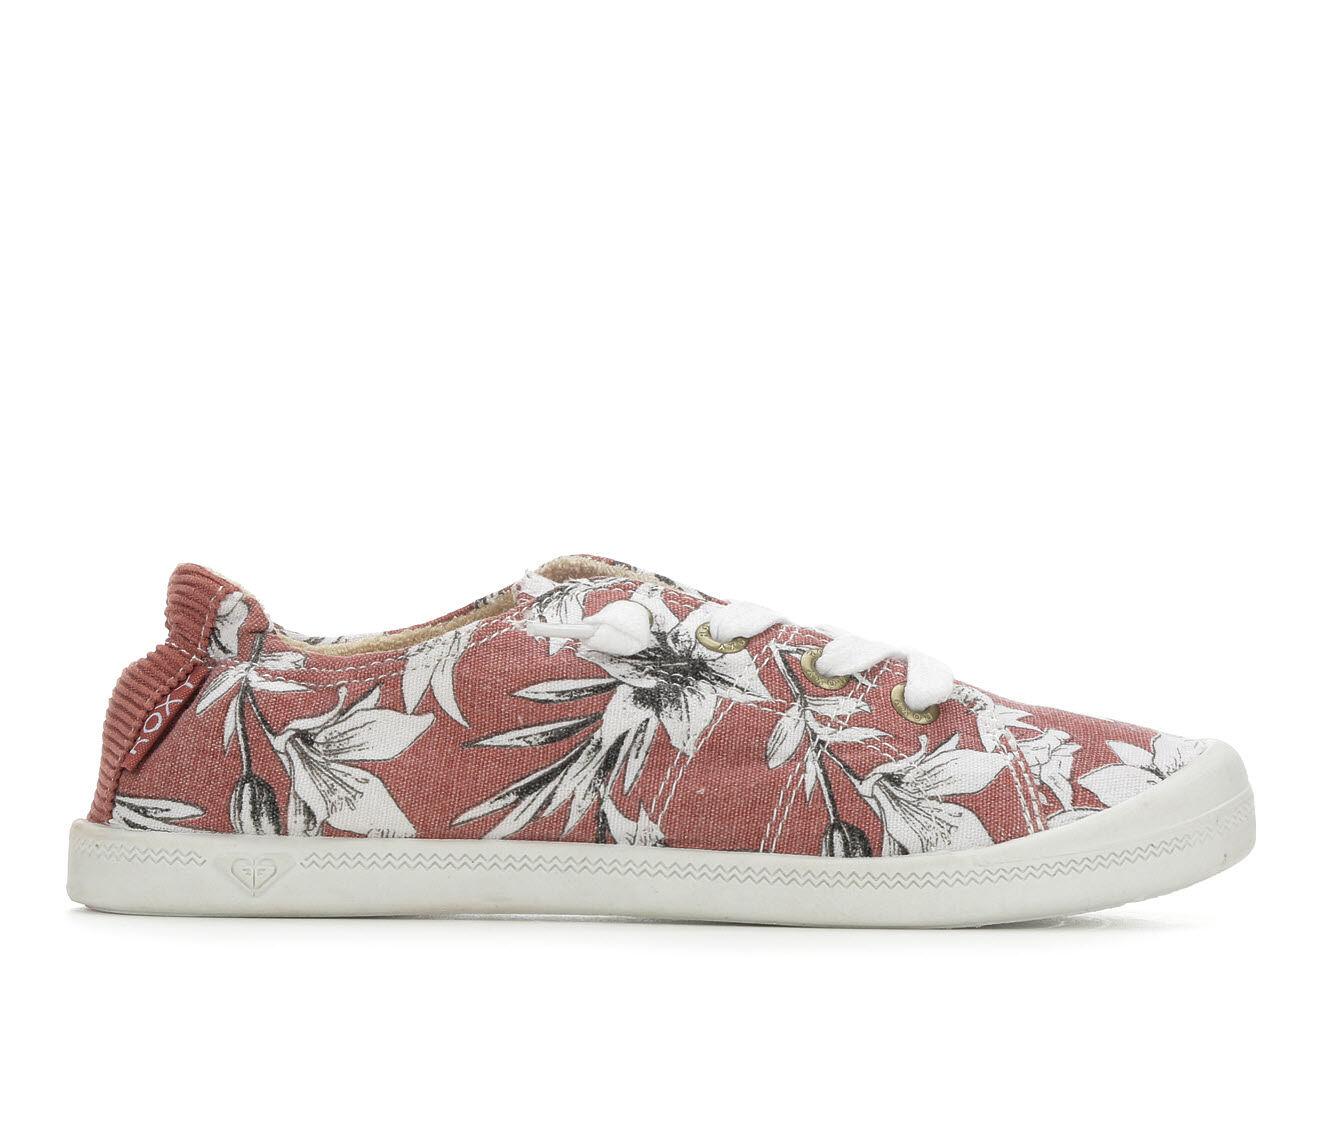 no tax Women's Roxy Bayshore Sneakers Spice Floral